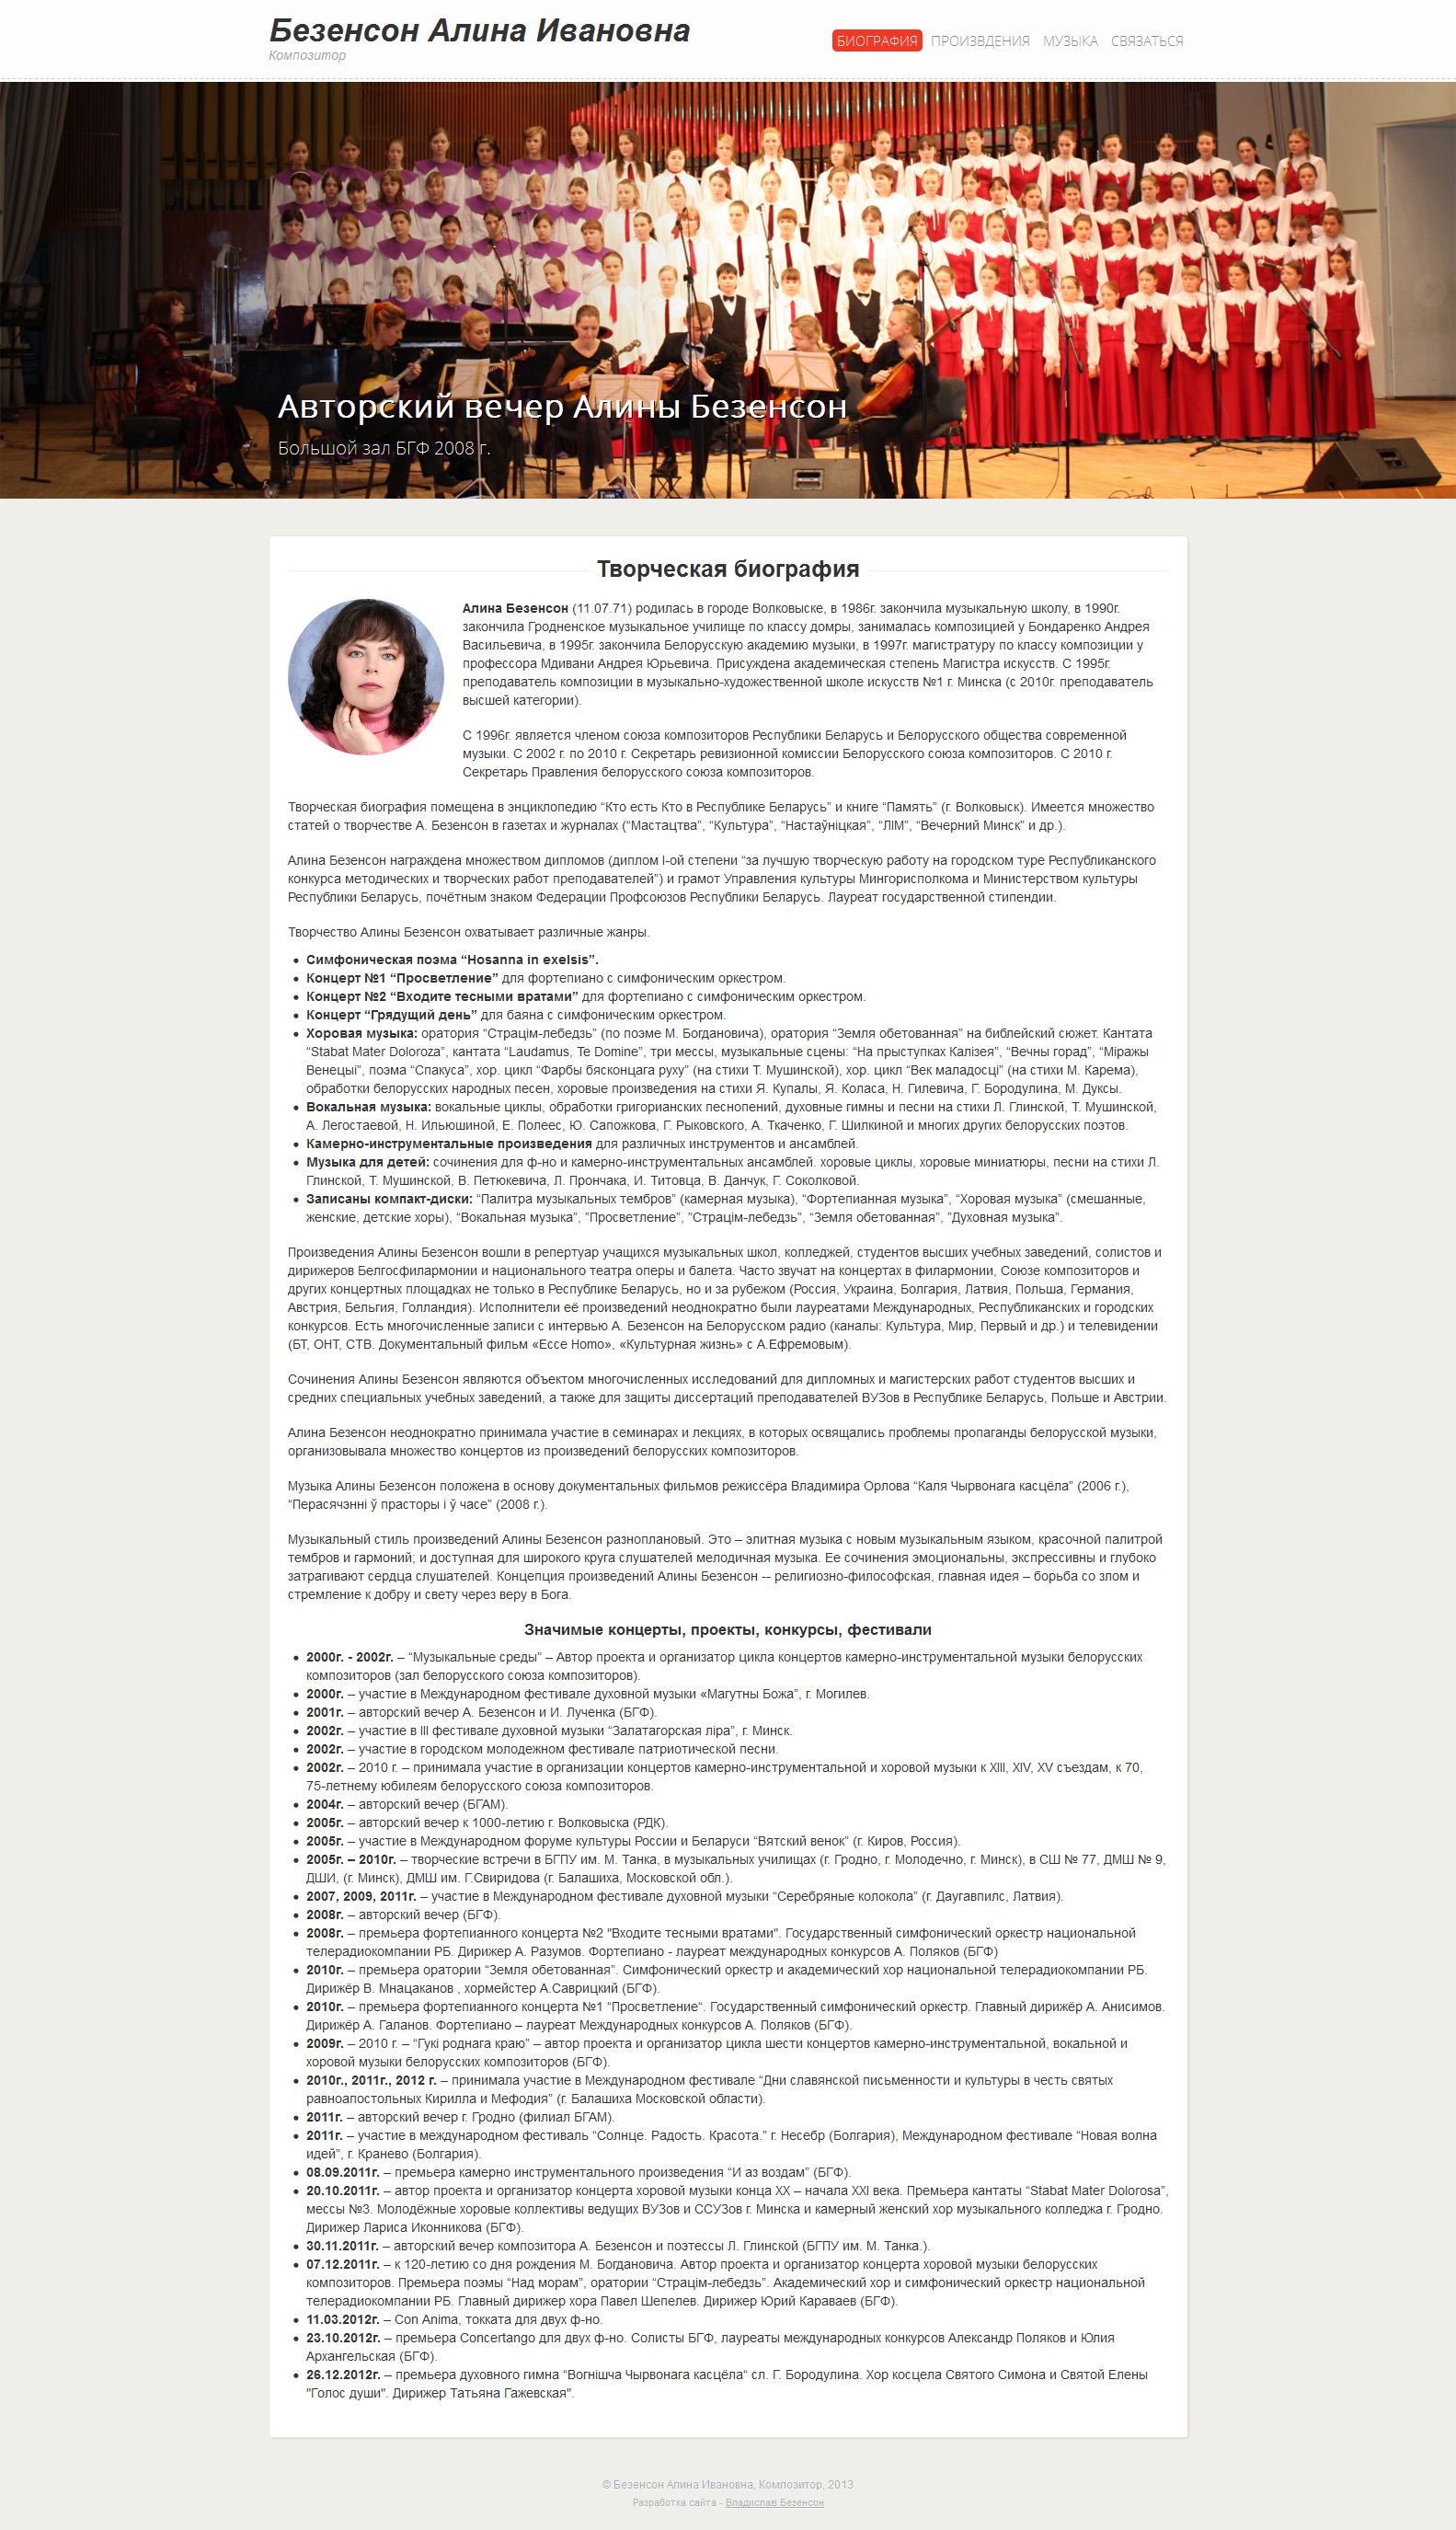 Сайт композитора Алины Безенсон